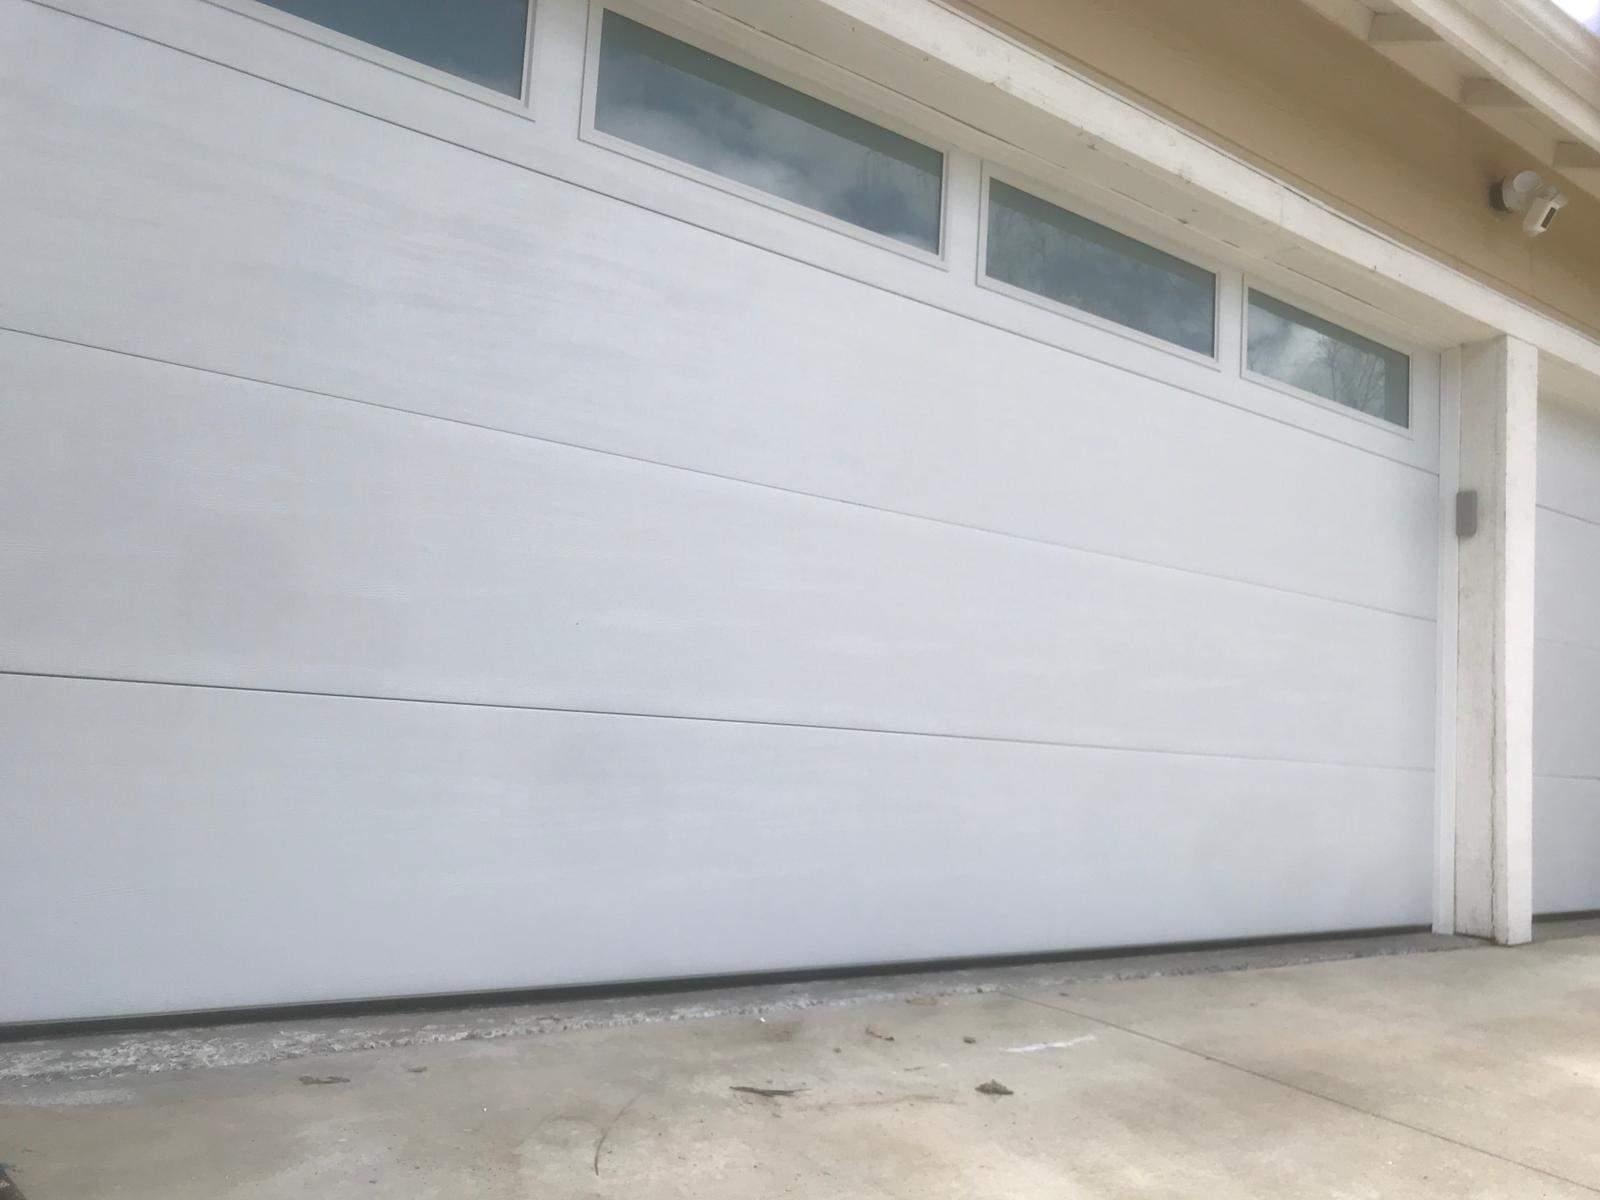 Gold River CA Garage Door Repair & Replacement